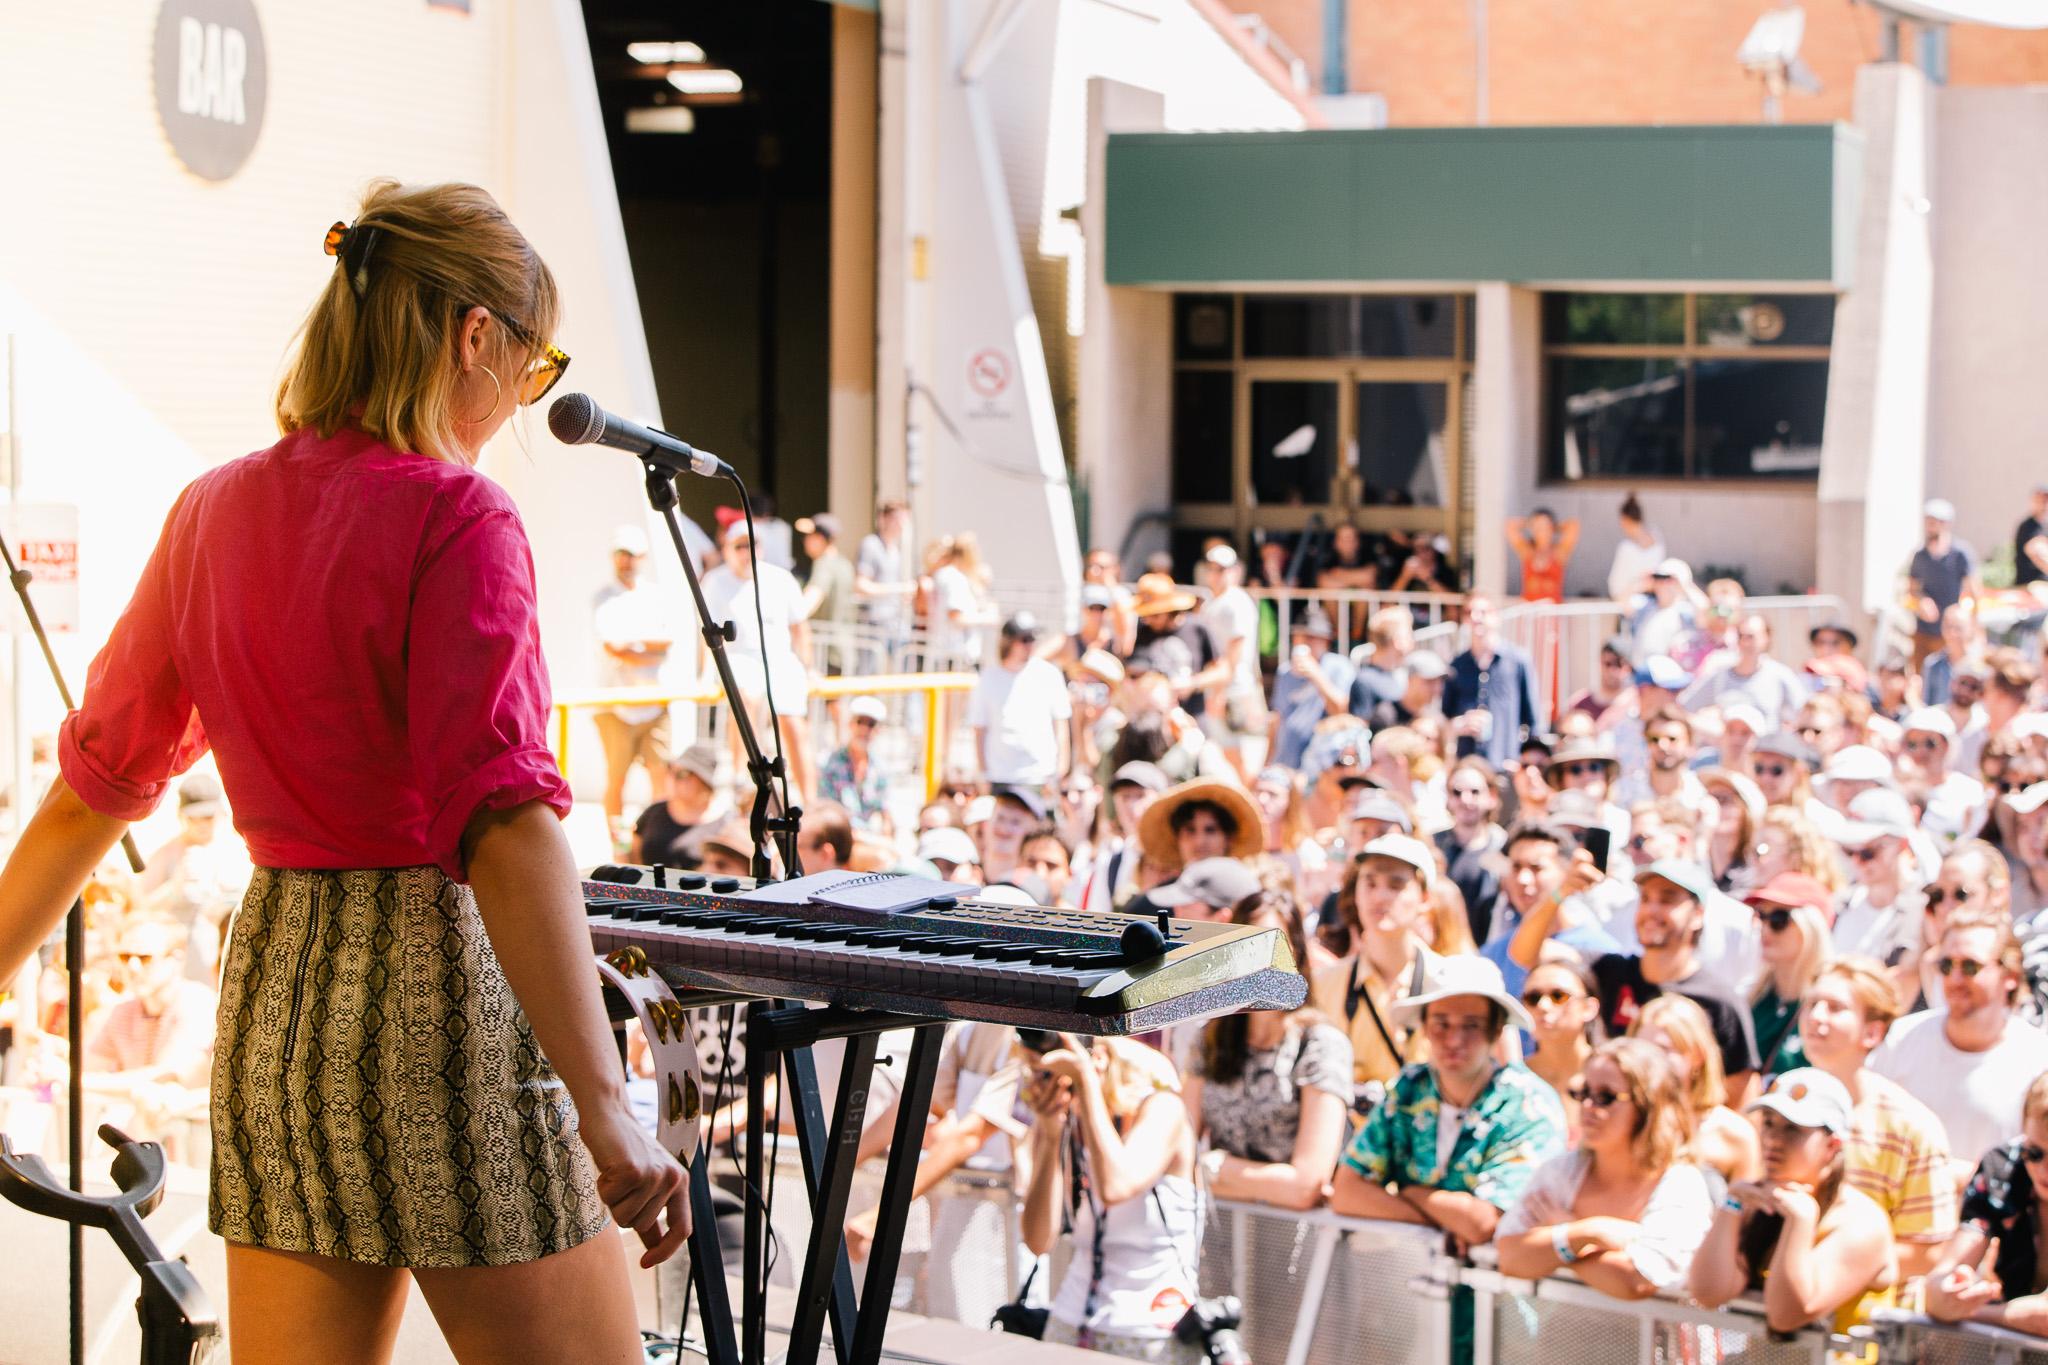 Alex Cameron_Laneway-Festival-Brisbane-2018_Credit-Bianca-Holderness-3.jpg